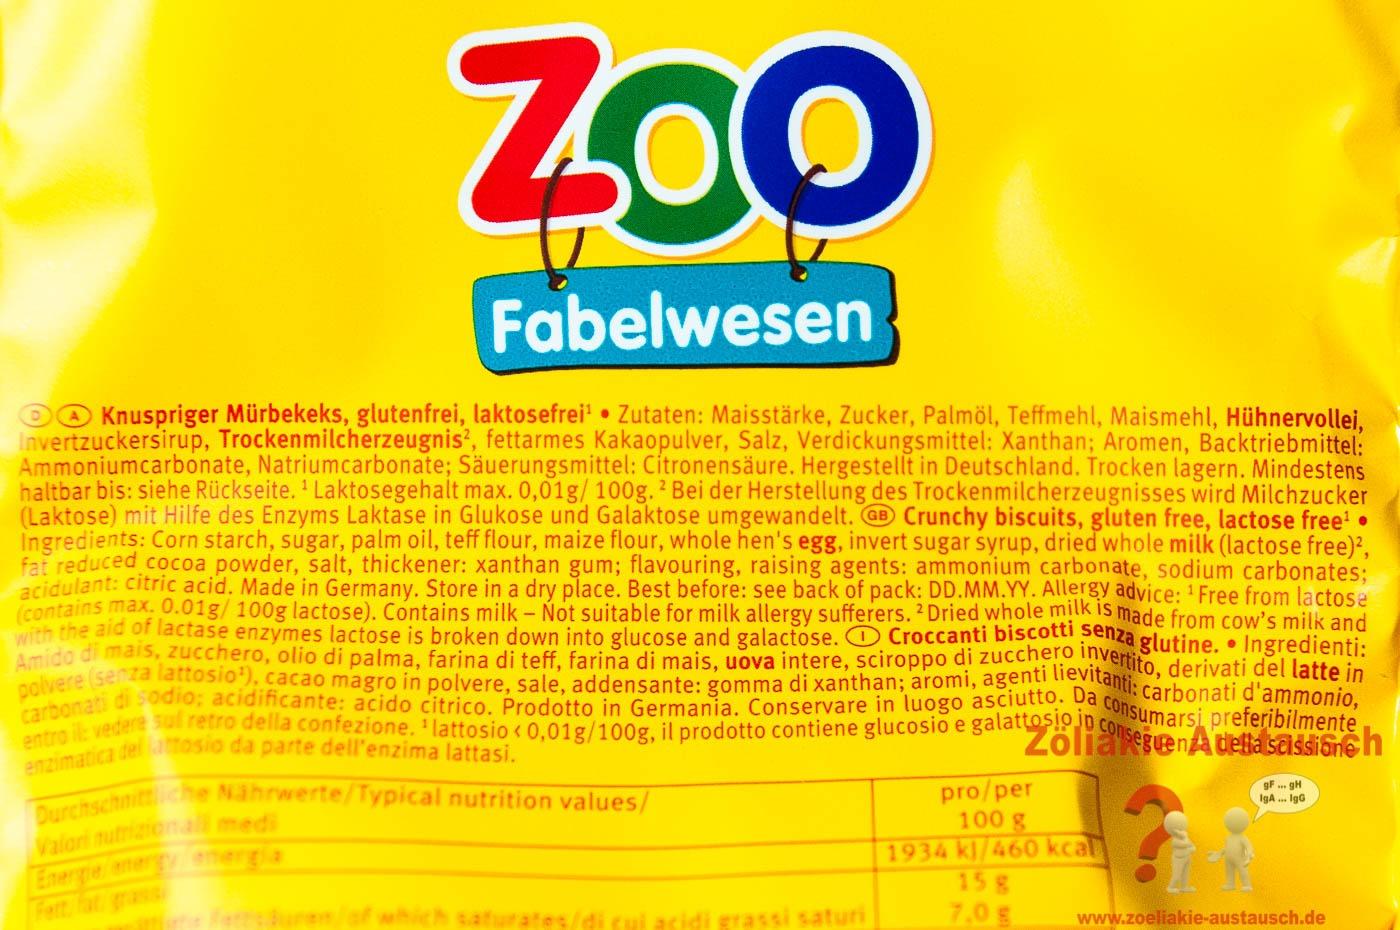 Zoeliakie_Austausch_Leibniz_Kekse-017